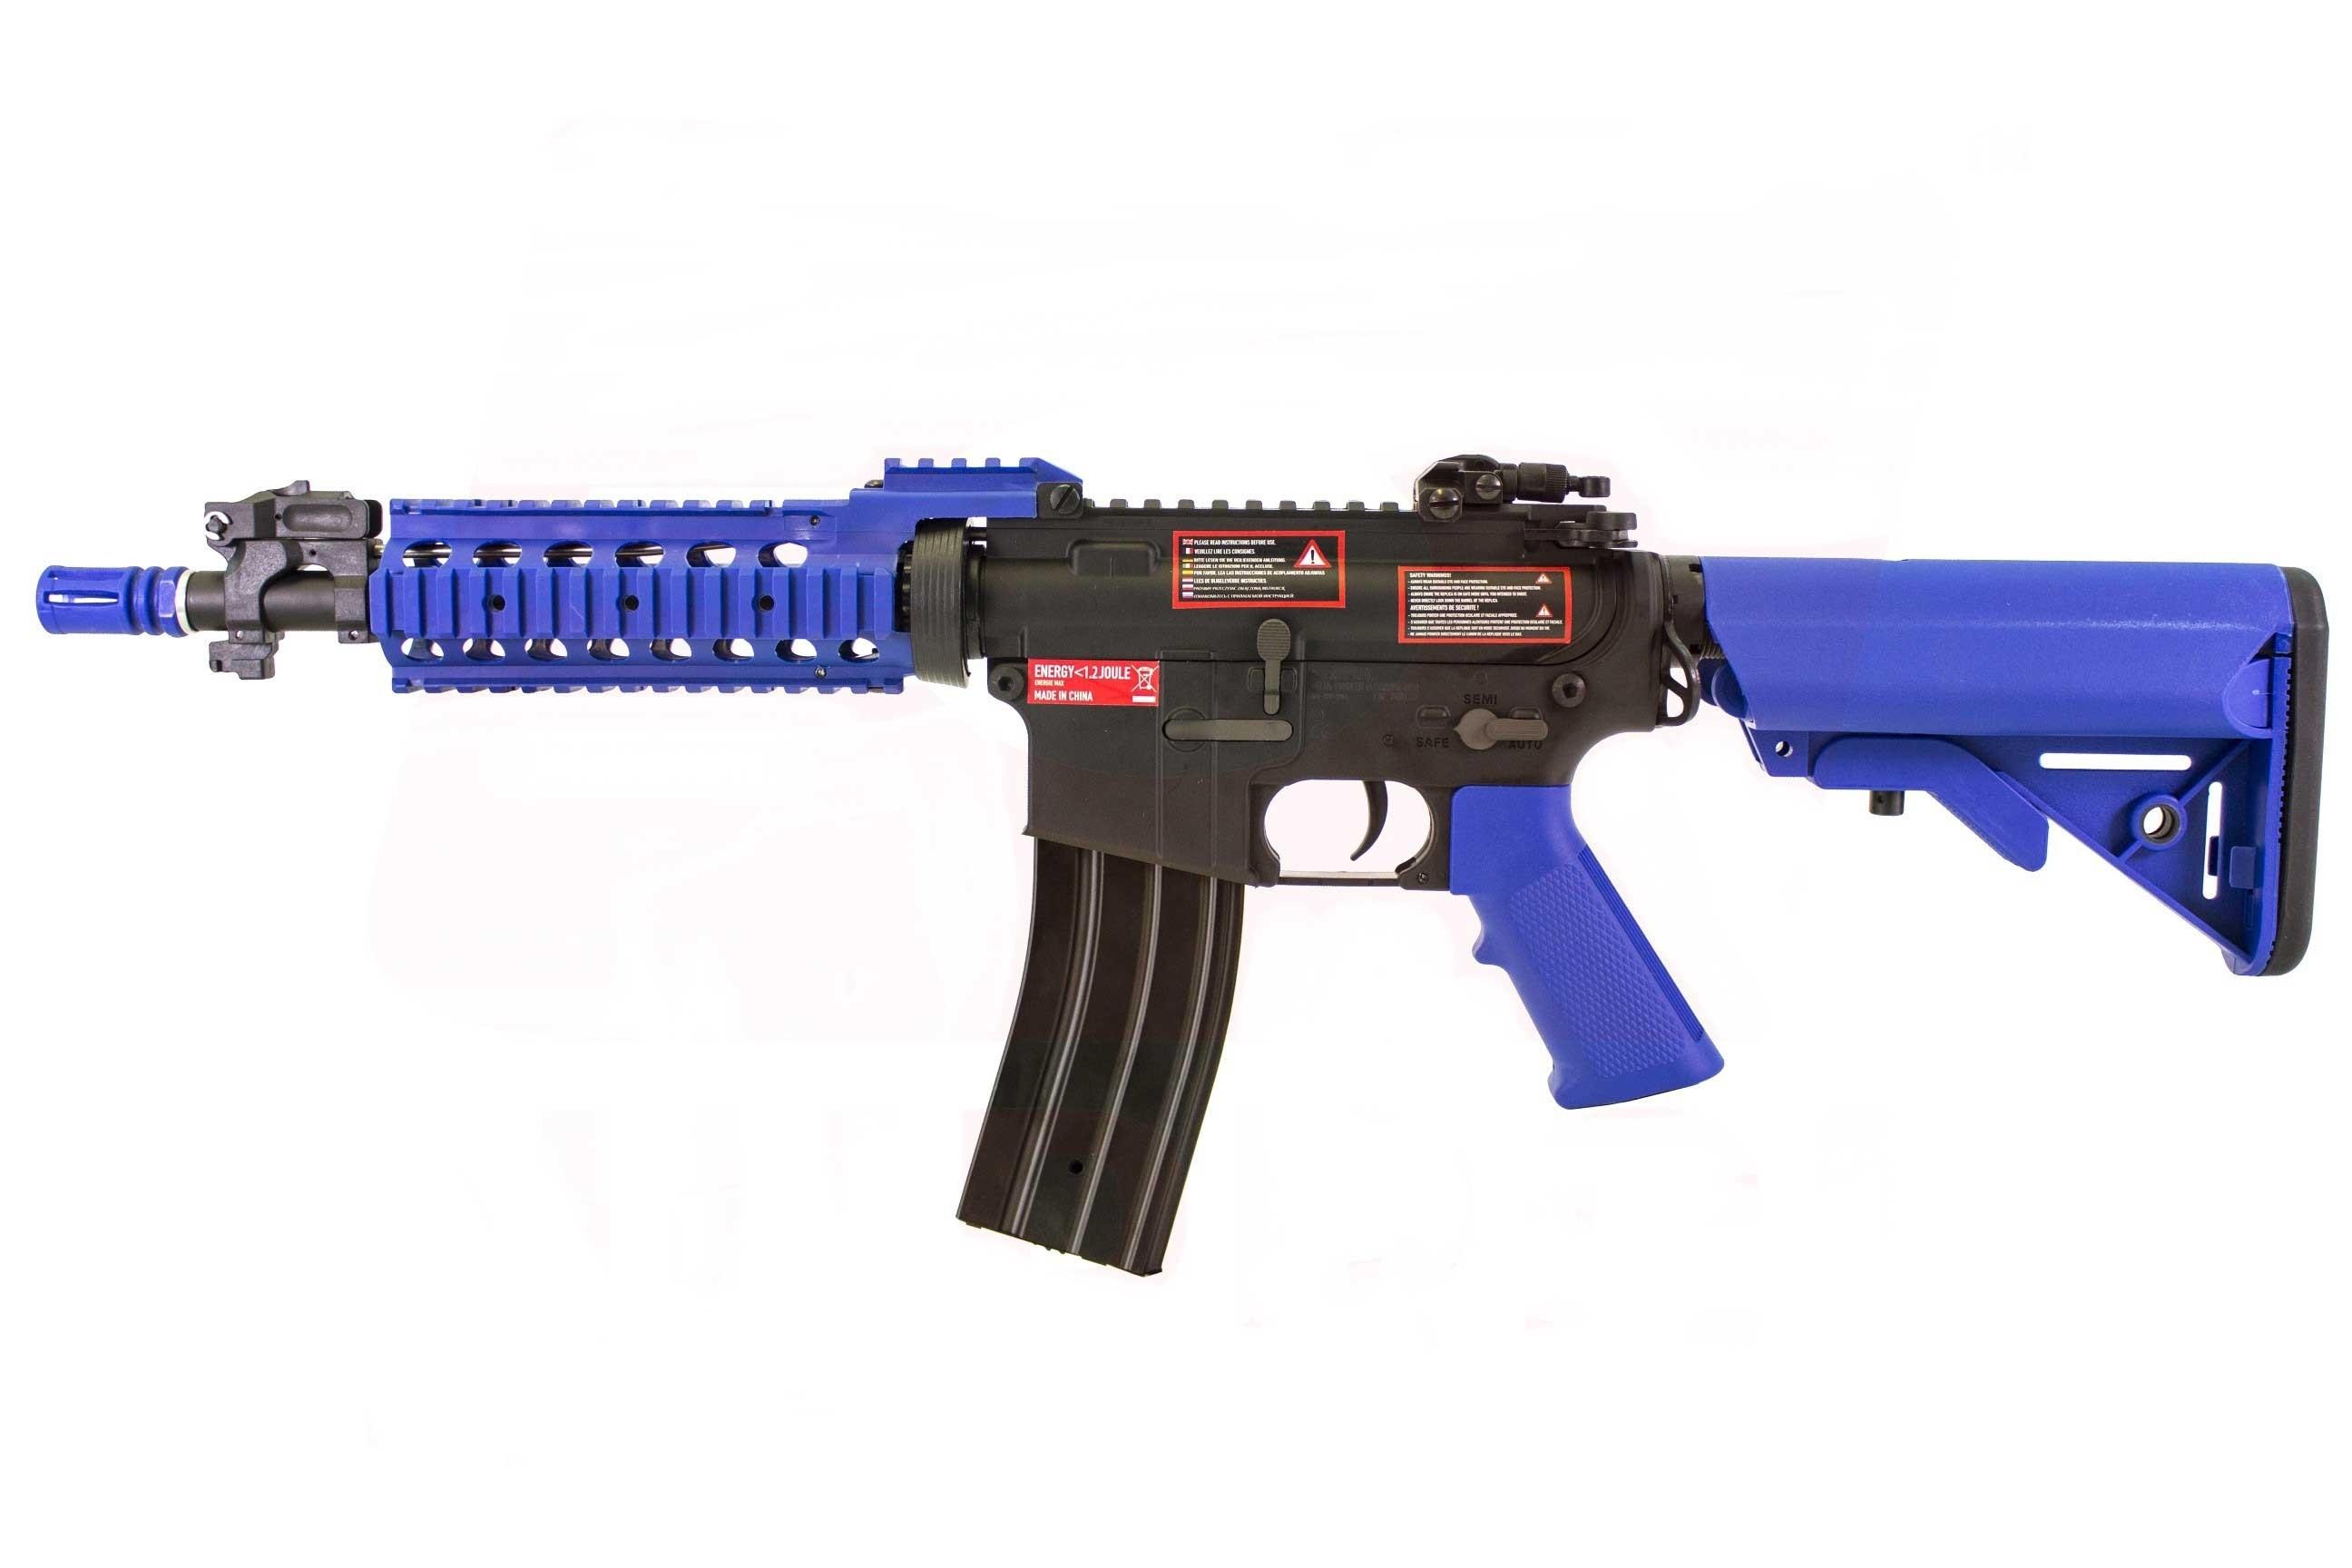 Nuprol Delta Pioneer Defender AEG Rifle (Dual Tone)